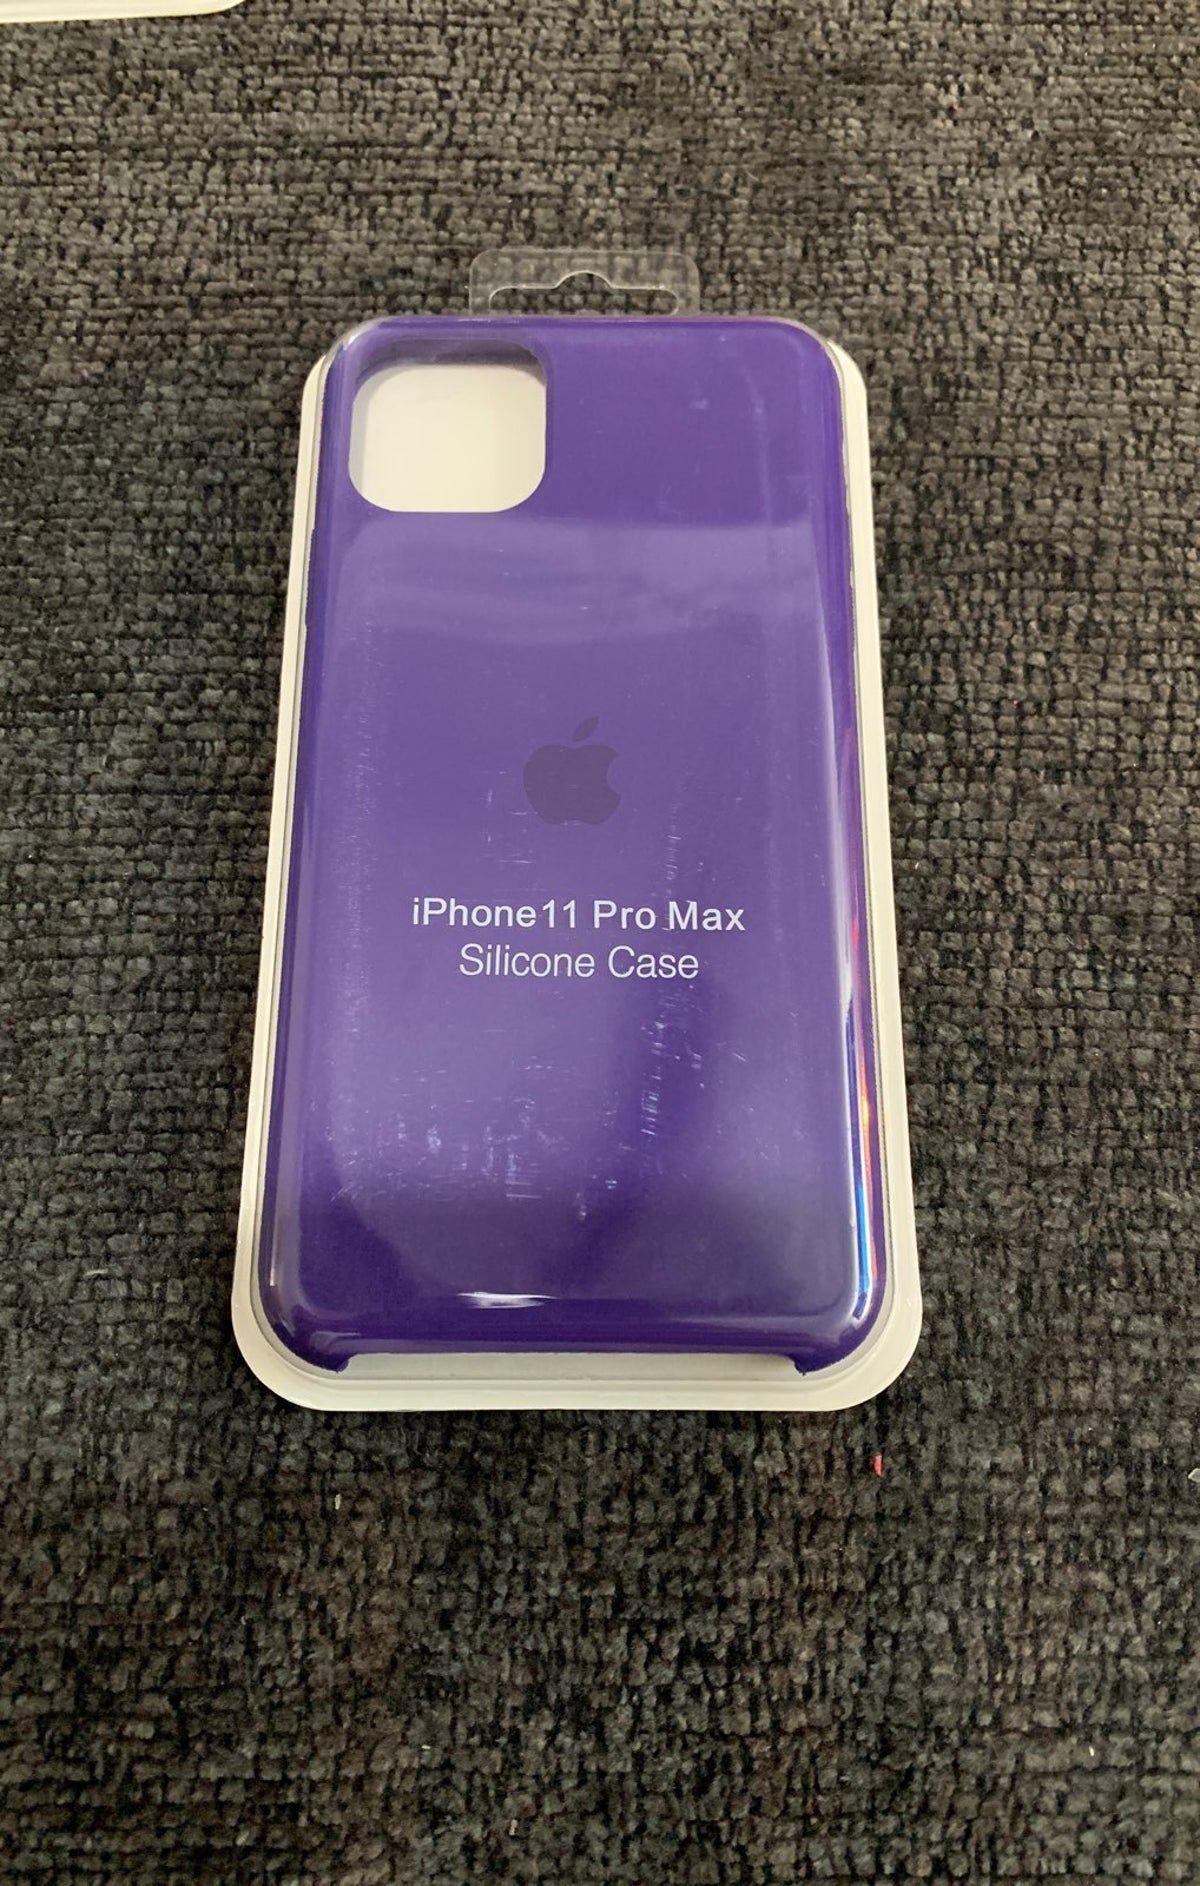 Iphone 11 Pro Max Silicon Case Phone Case Diy Paint Iphone 11 Pro Max Silicone Case Diy Phone Case